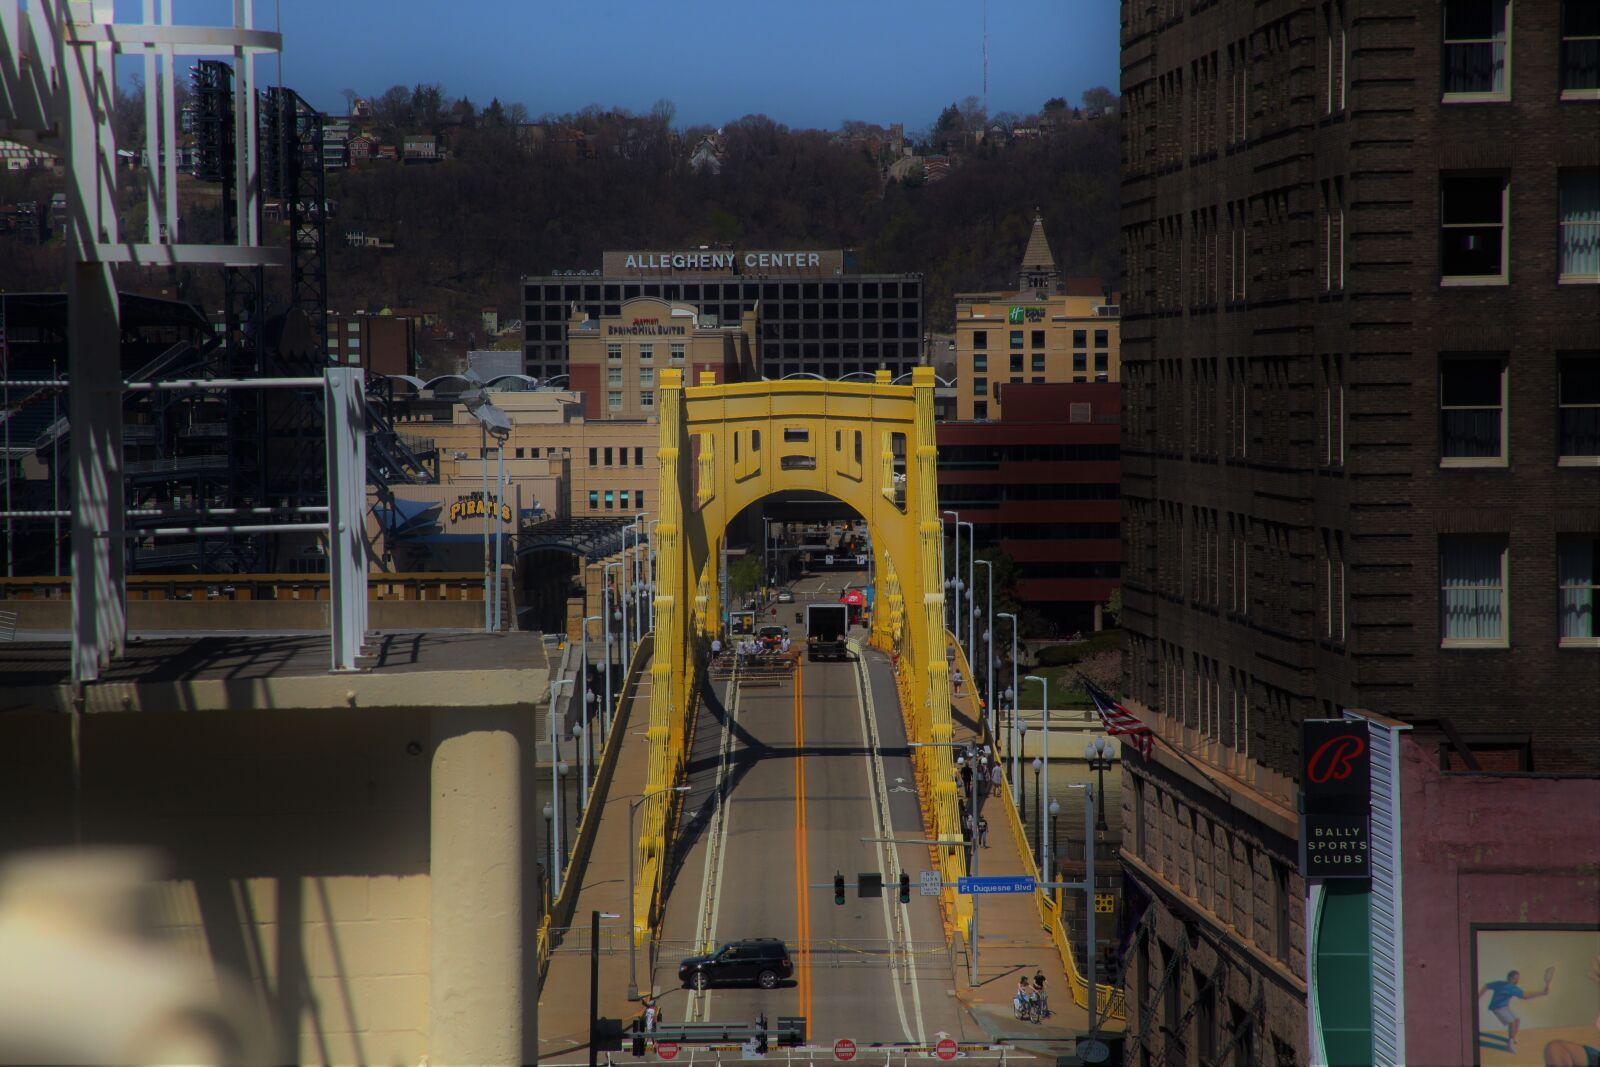 bridge, downtown, pittsburgh, street, Canon EOS 5D MARK II, Canon EF 28-135mm f/3.5-5.6 IS